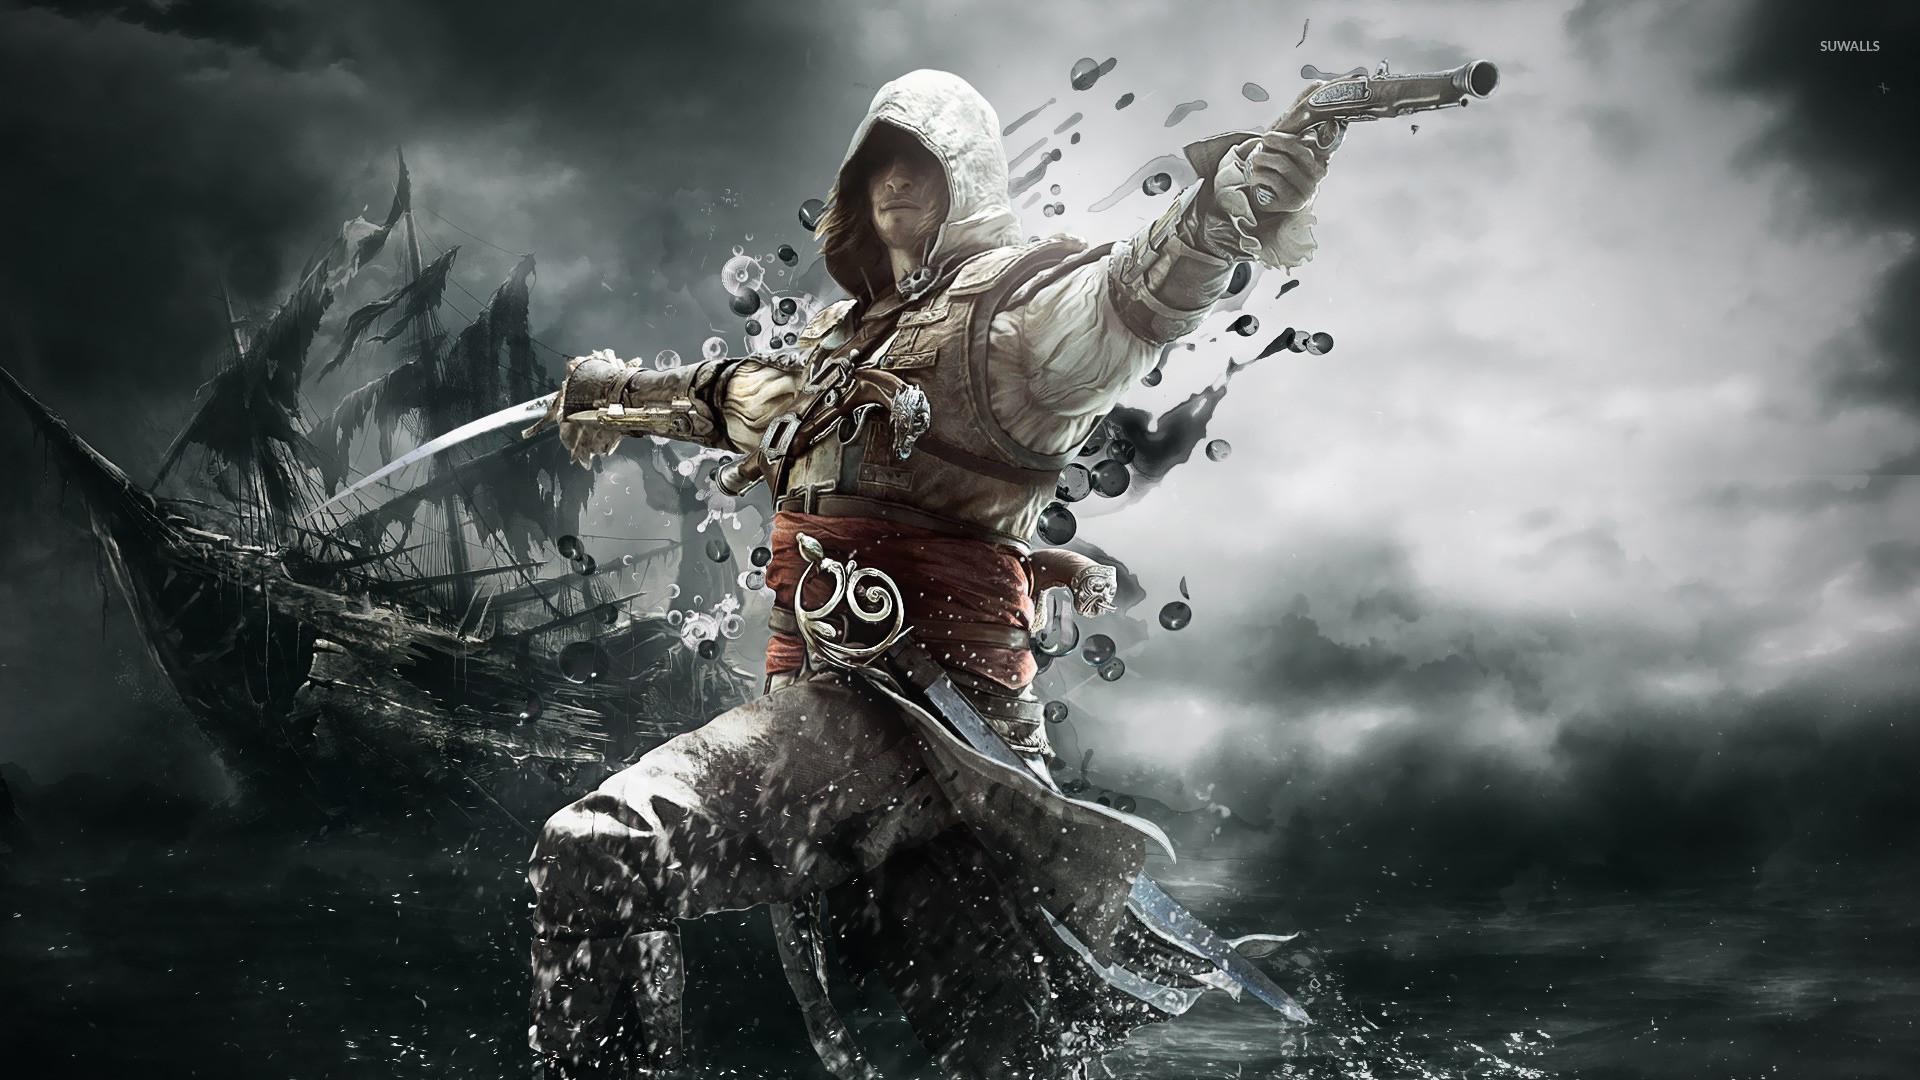 Edward Kenway – Assassin's Creed IV: Black Flag [2] wallpaper jpg